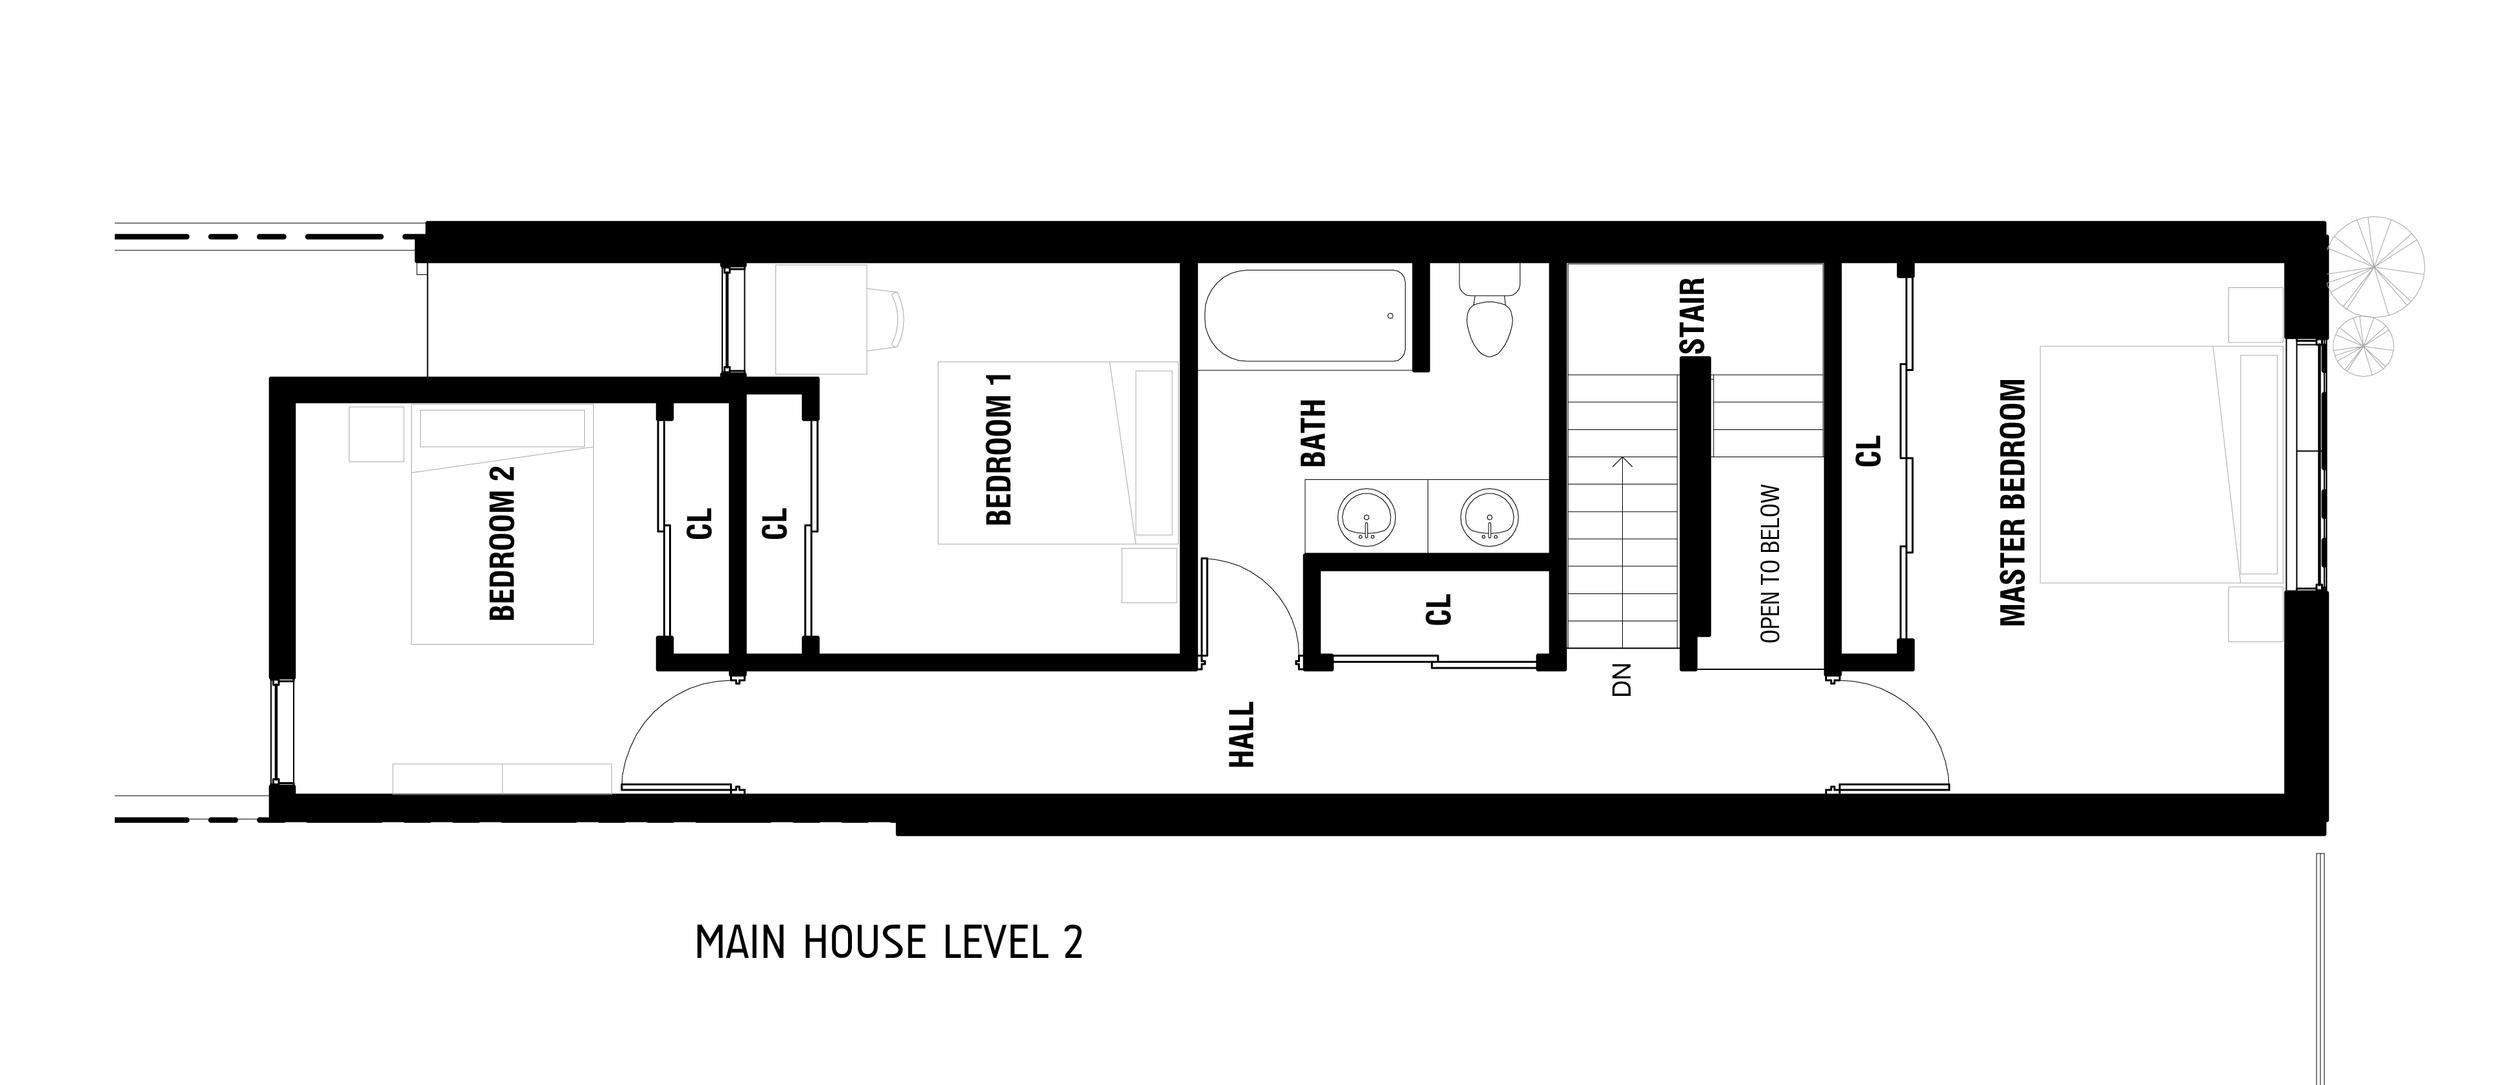 2135 E Sergeant_Floor Plan MH02.jpg